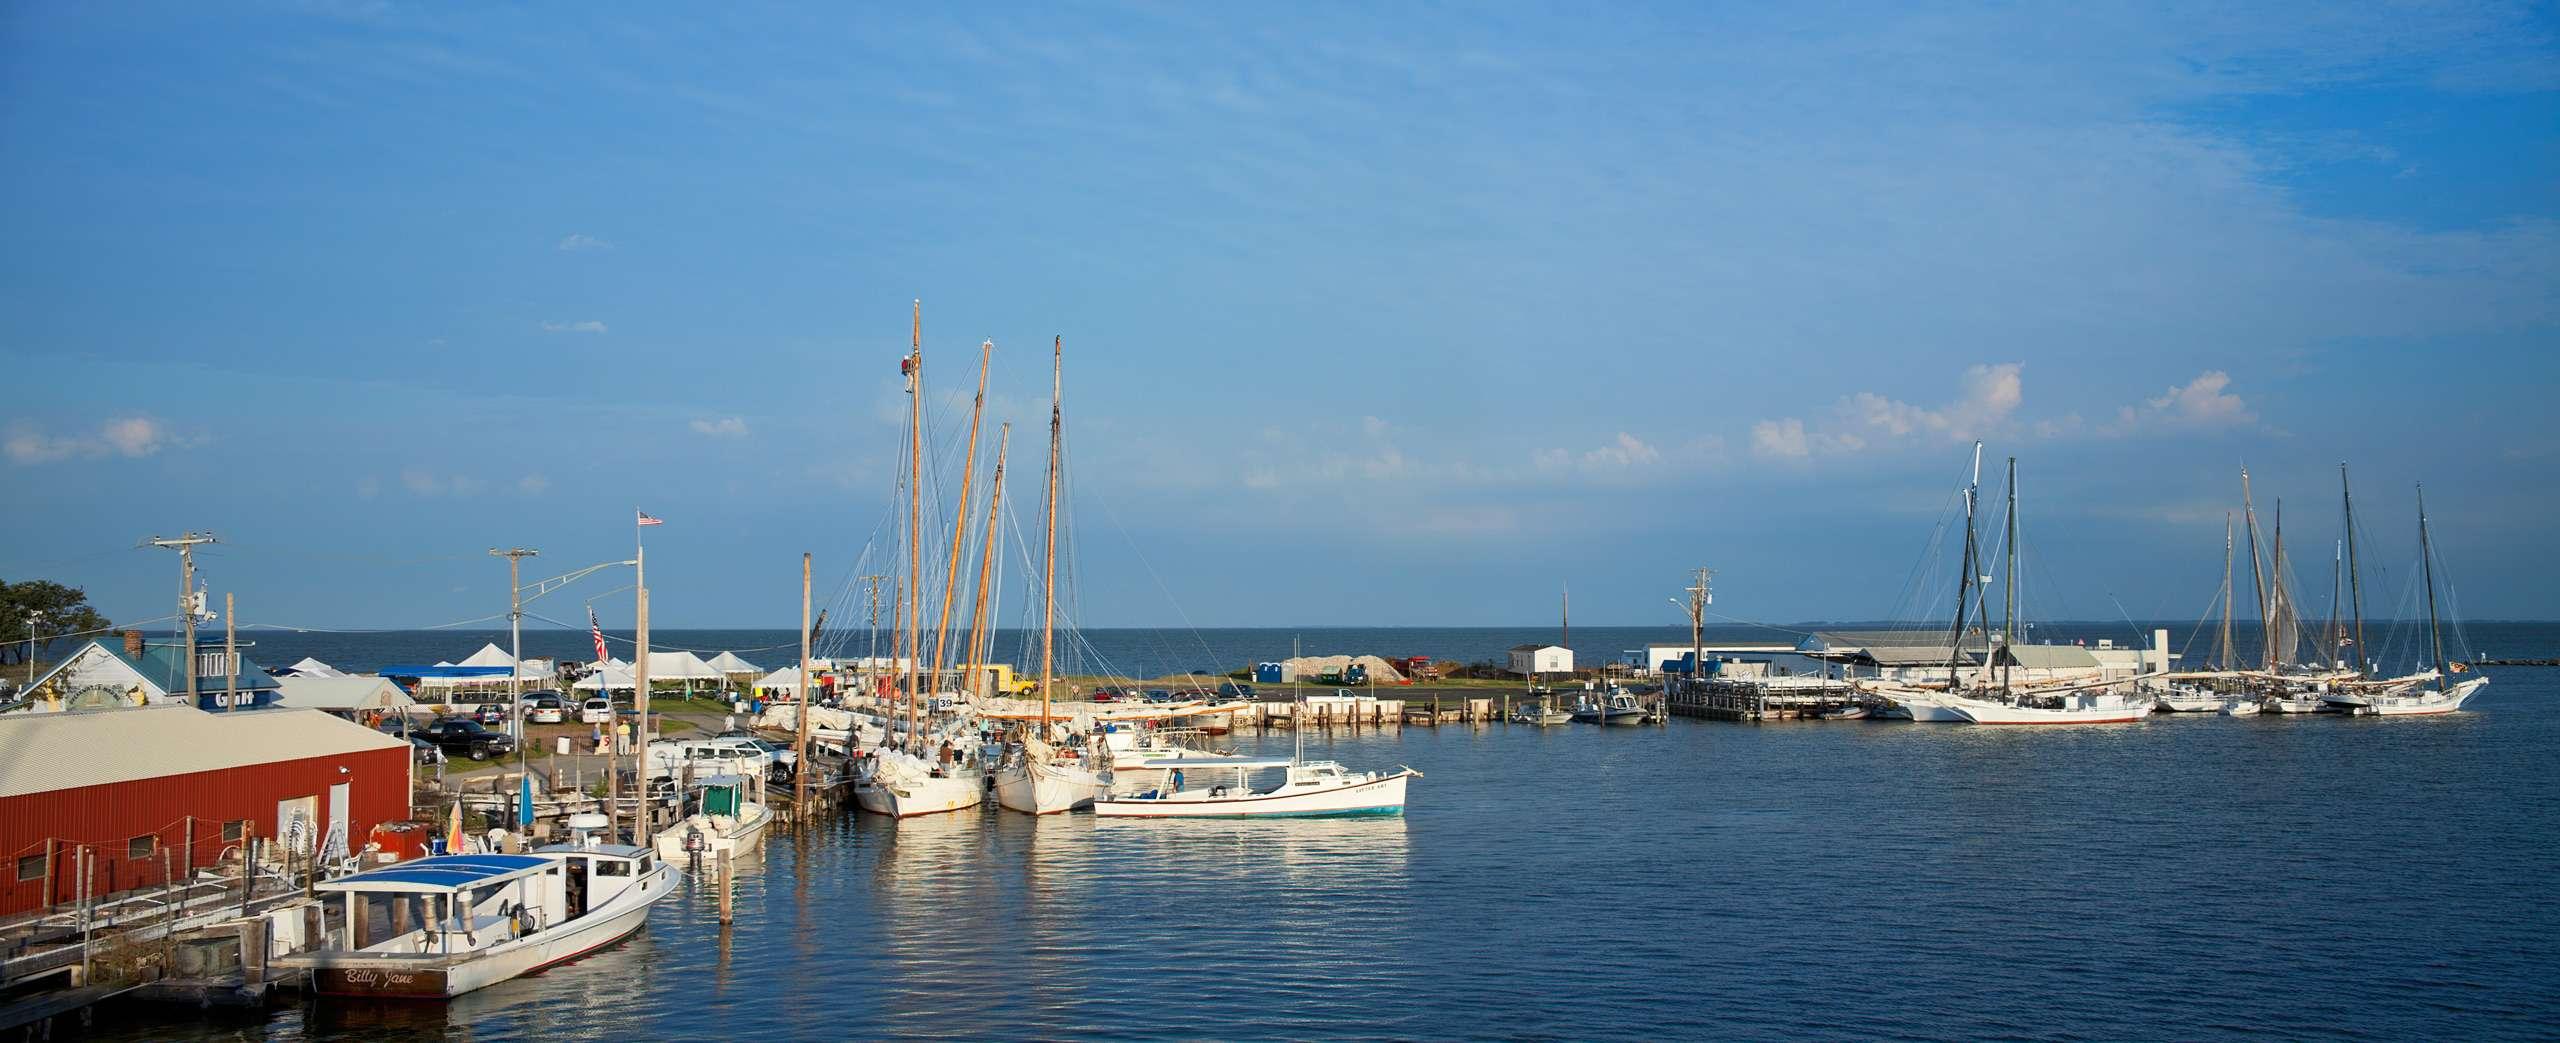 PORTFOLIO - Sailing - Skipjacks #18  PCG662